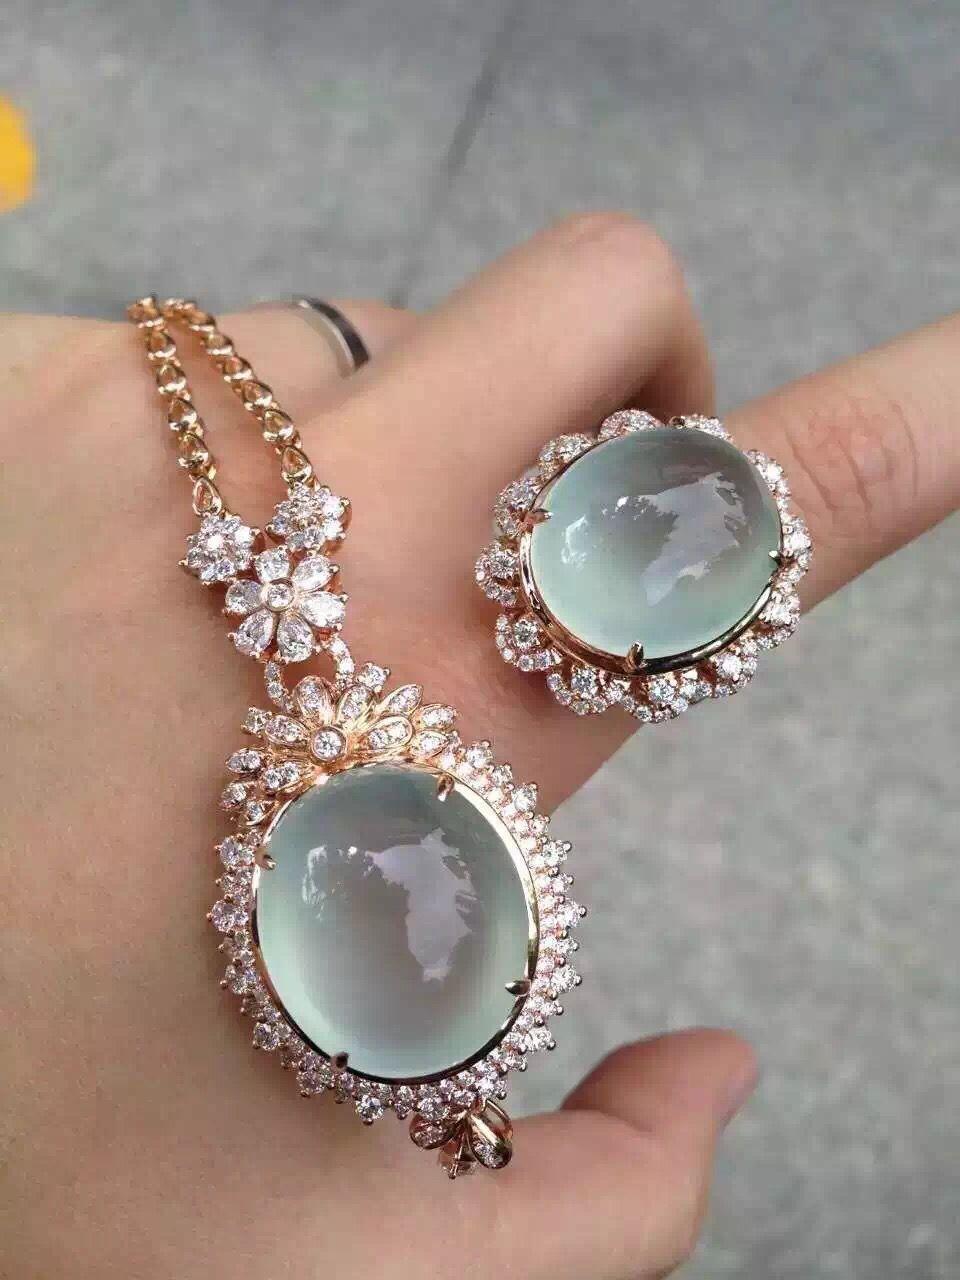 Transparent icy clear jade pendant ring jewelry set k u pinteresu